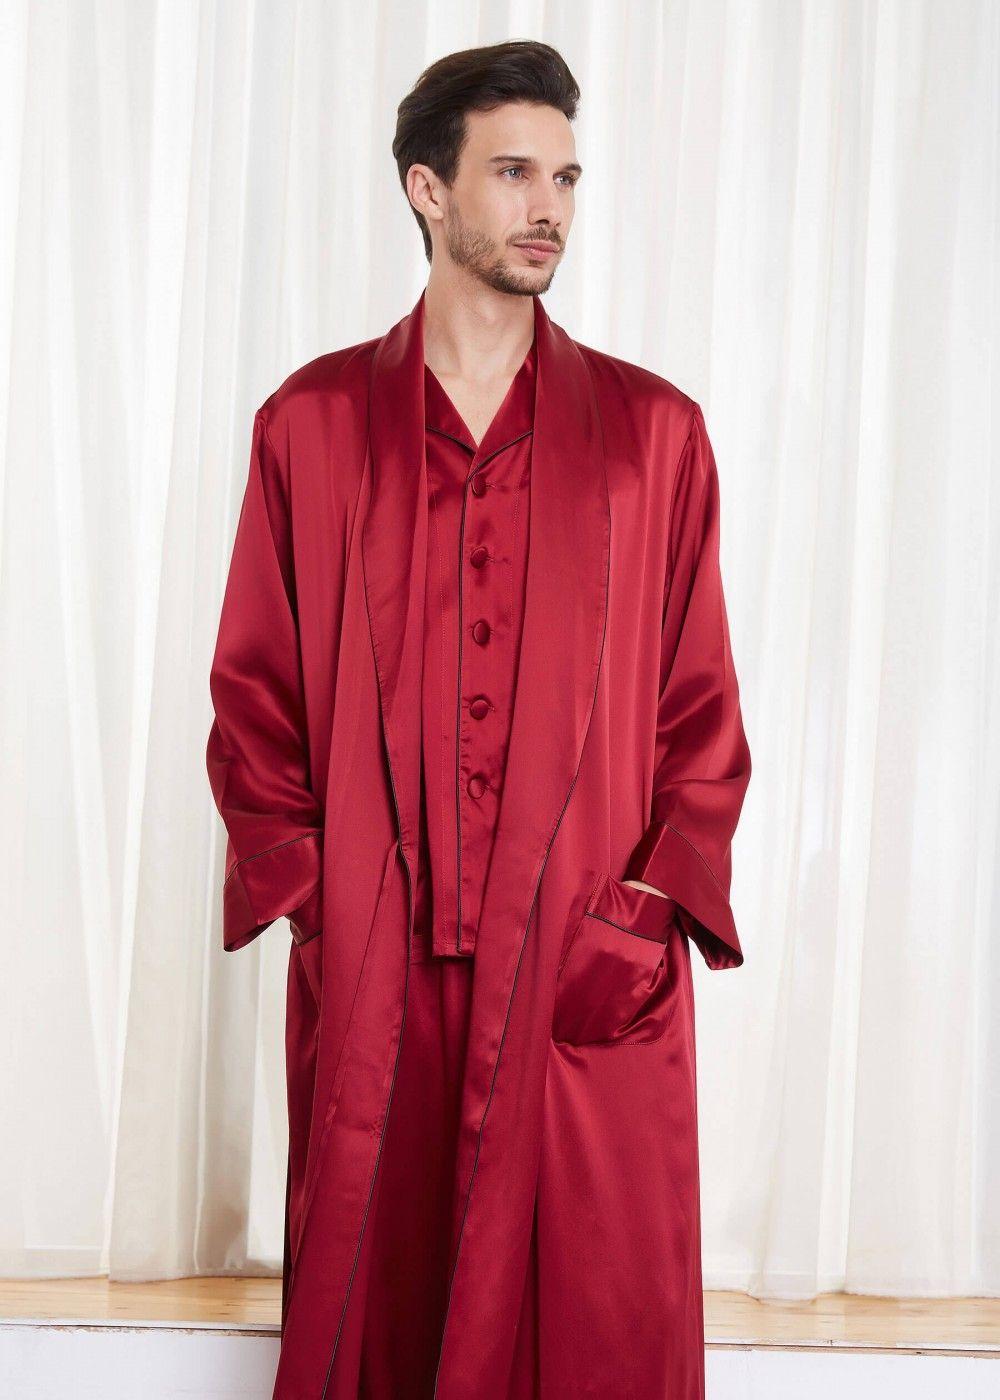 d8404db57e2d 22 momme contra full length silk pajamas   robe set for men